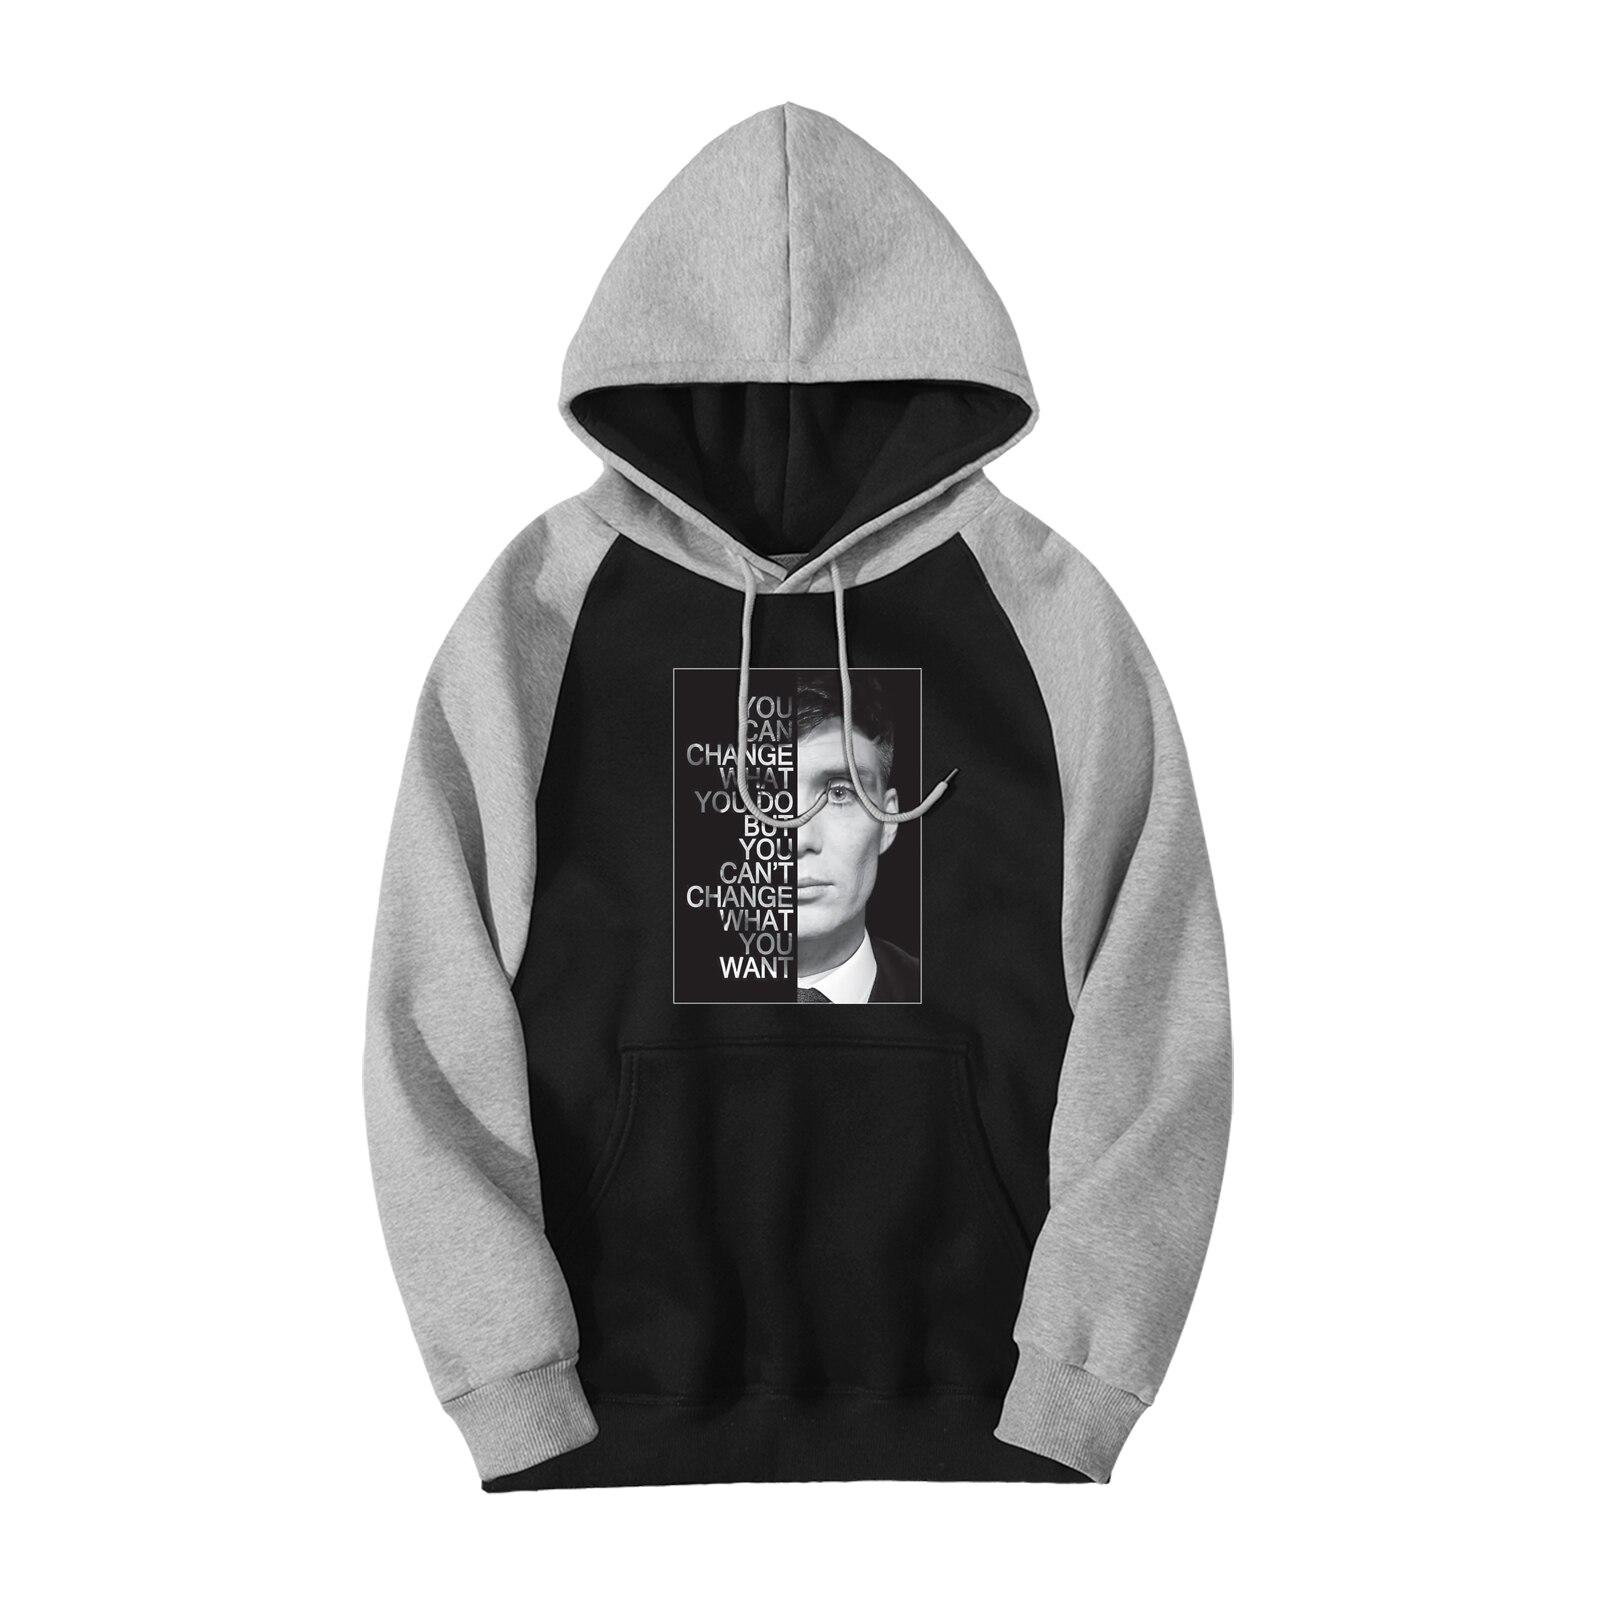 Peaky Blinders TV Show Raglan Hoodies Men 2019 Autumn Winter Casual Sweatshirts Bodywarmer Fashion Fitness Hip Hop Streetwear